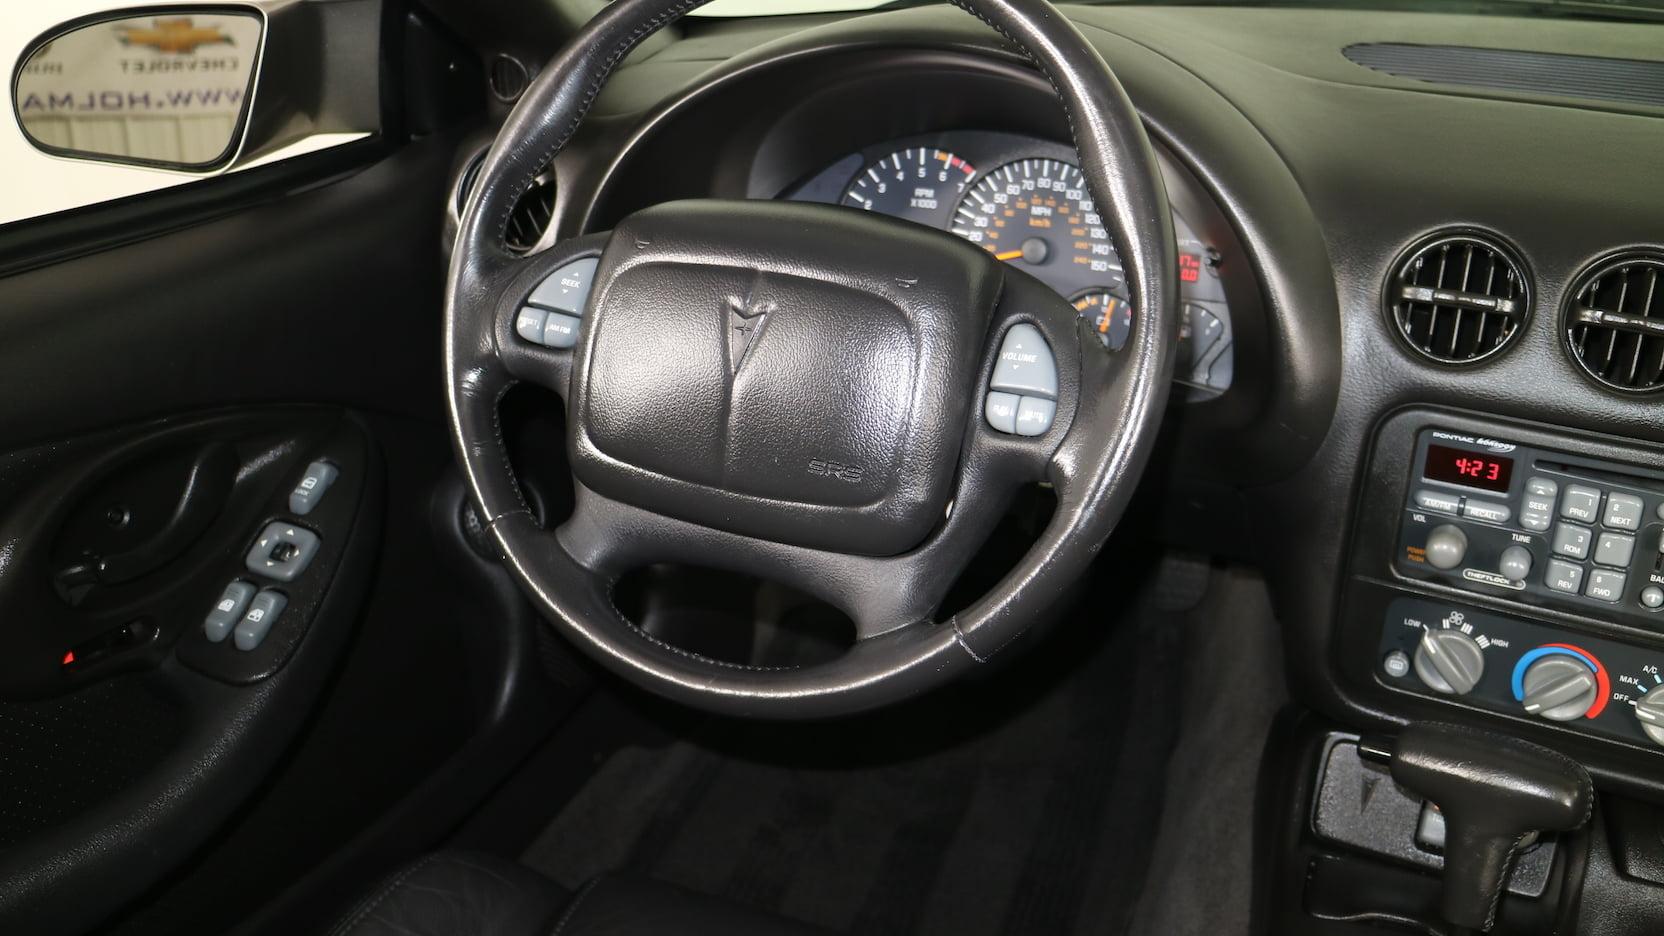 2001 Pontiac Firebird Trans Am WS6 steering wheel